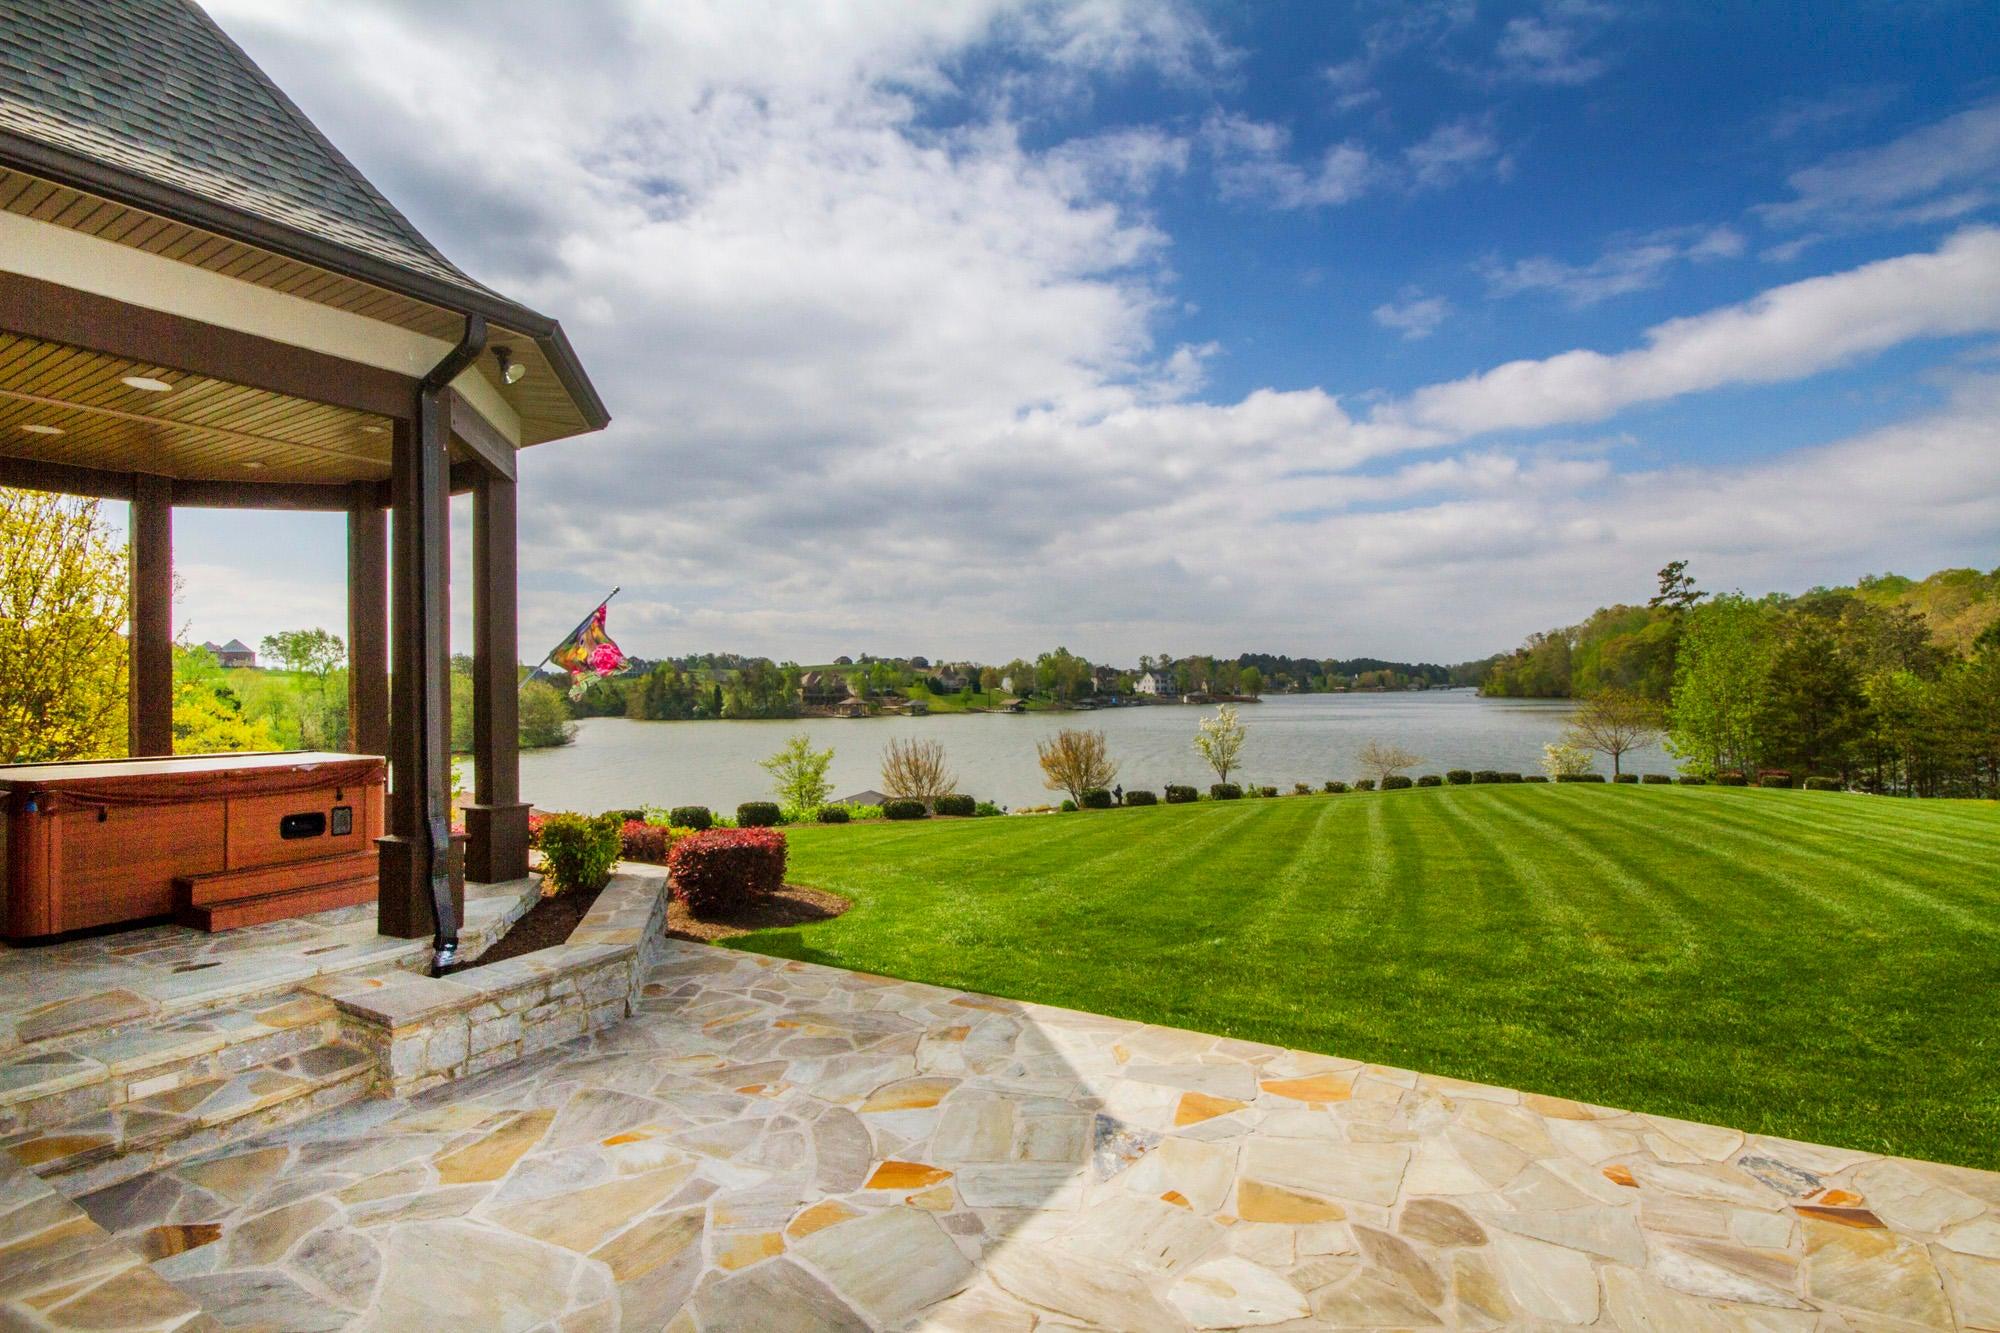 Penninsula Lake Views all Around!